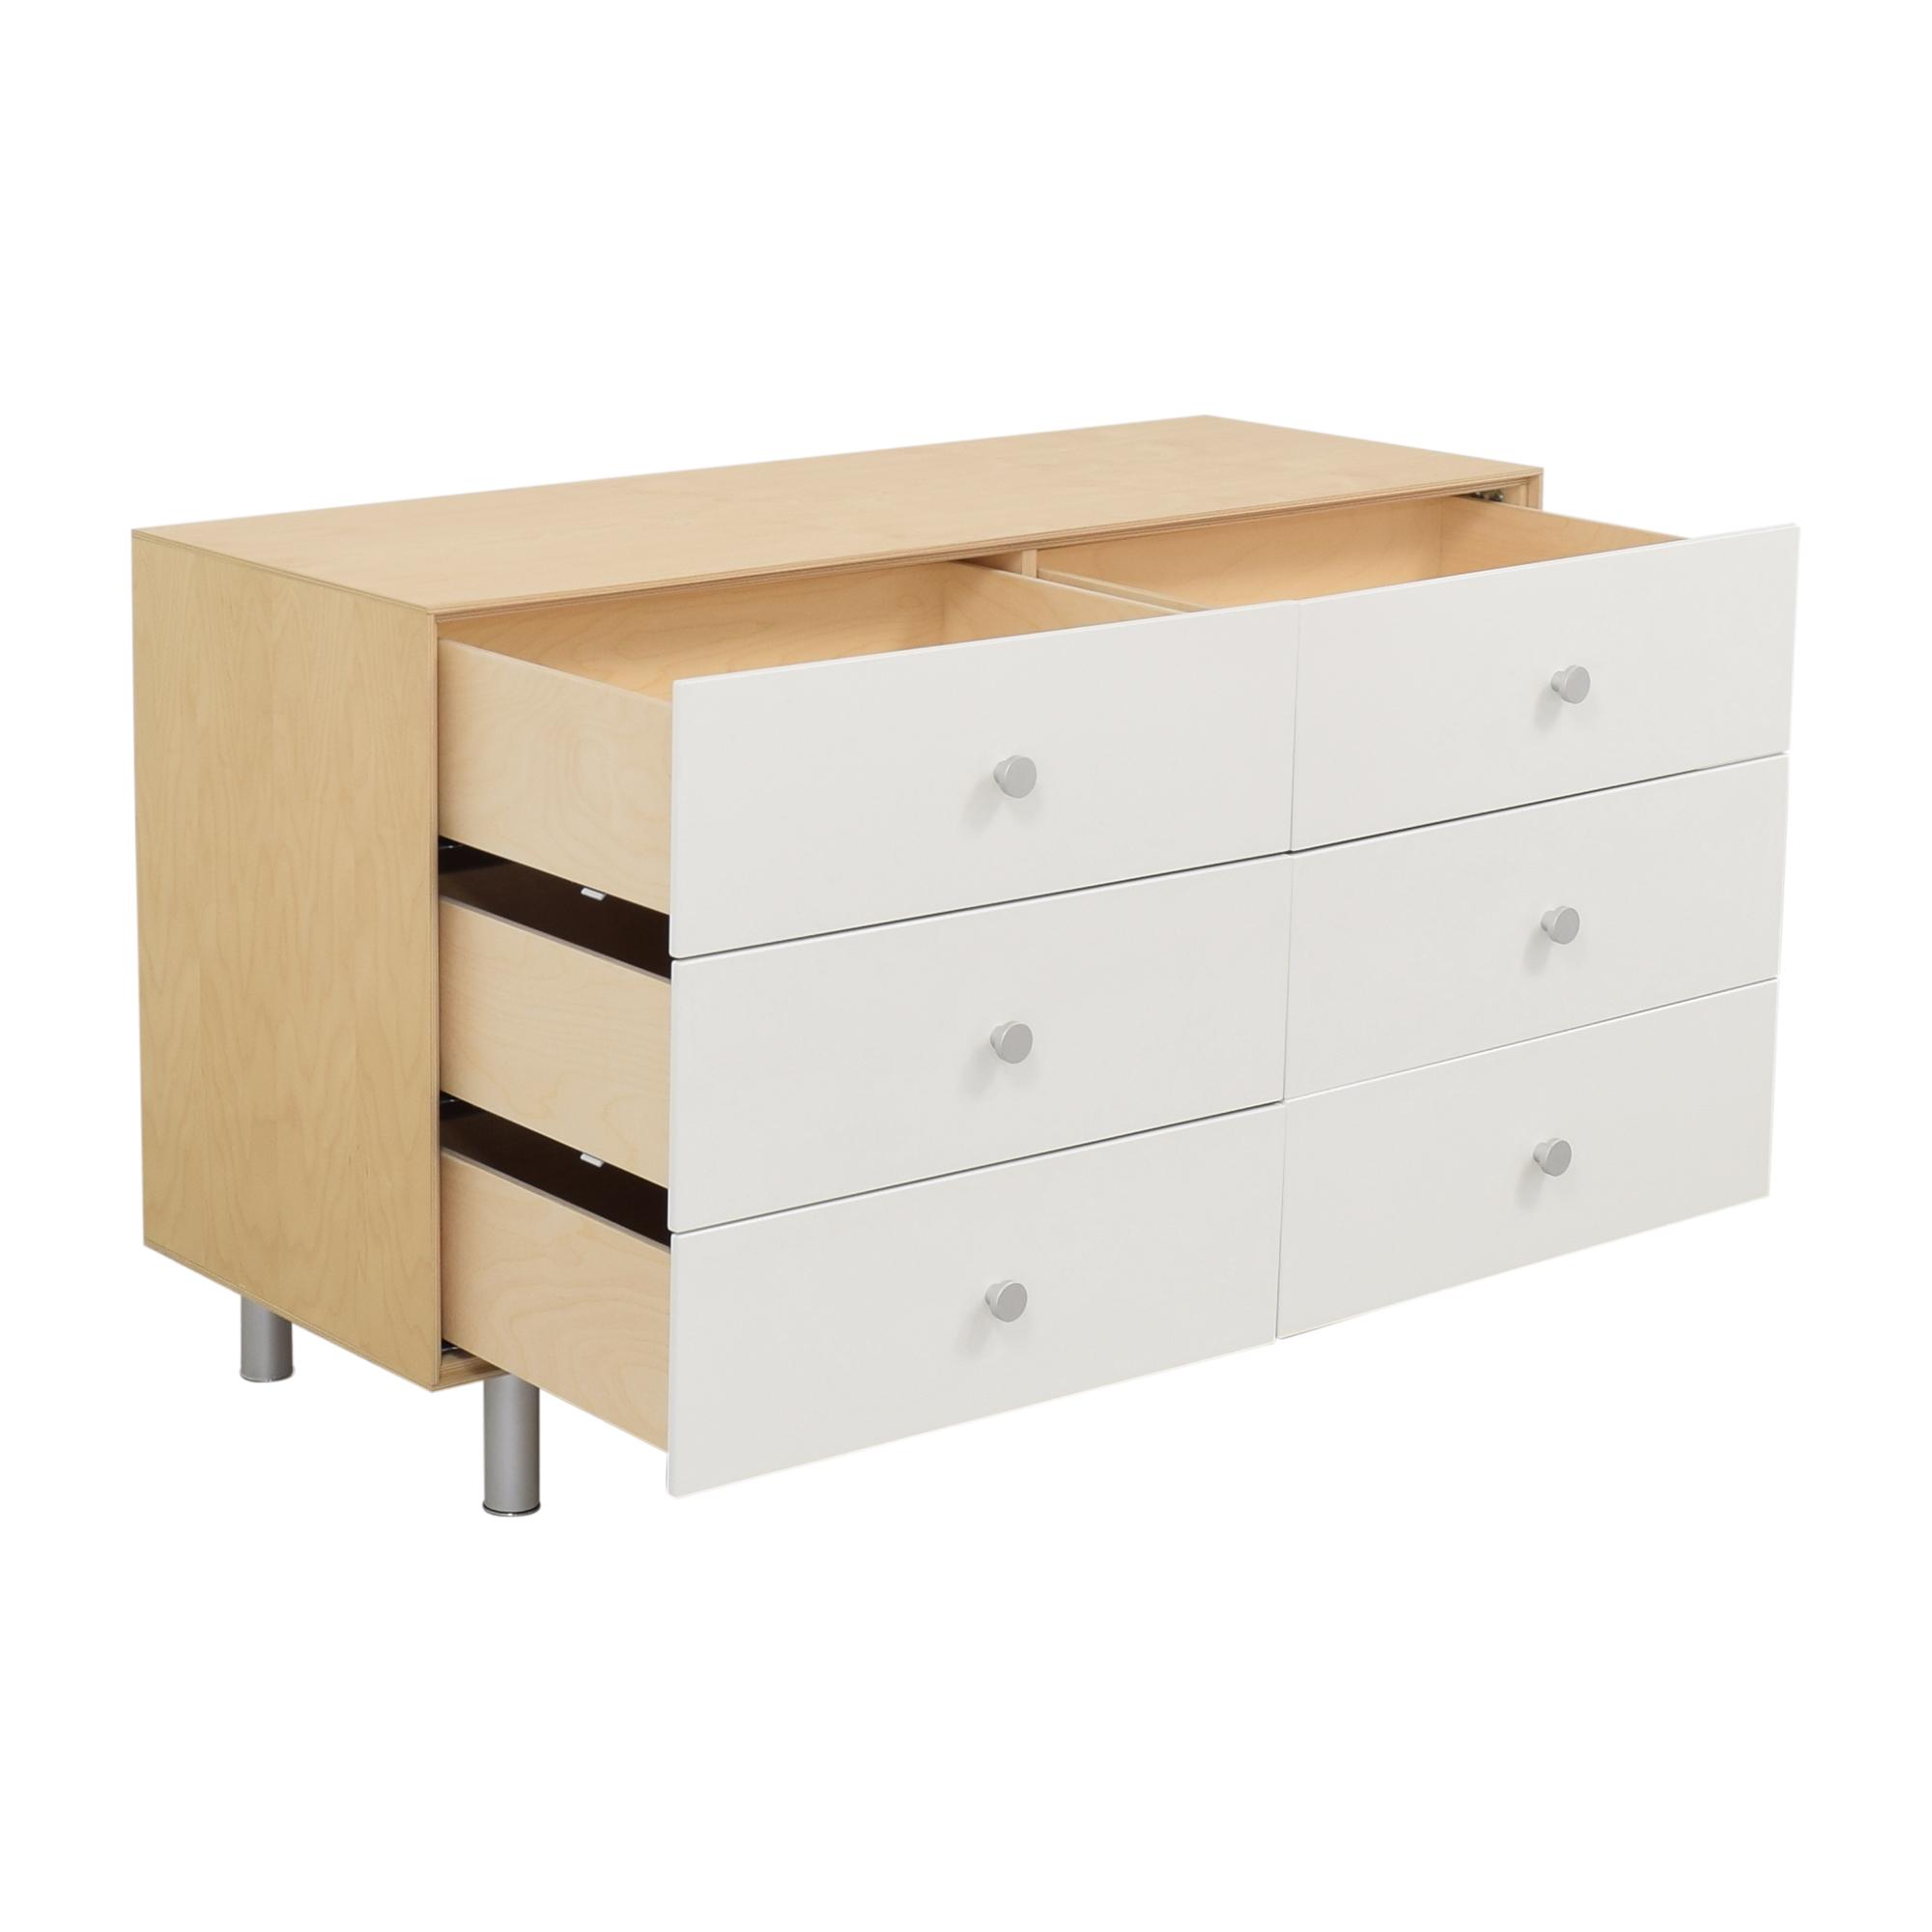 Oeuf Oeuf Merlin Rhea 6 Drawer Dresser dimensions